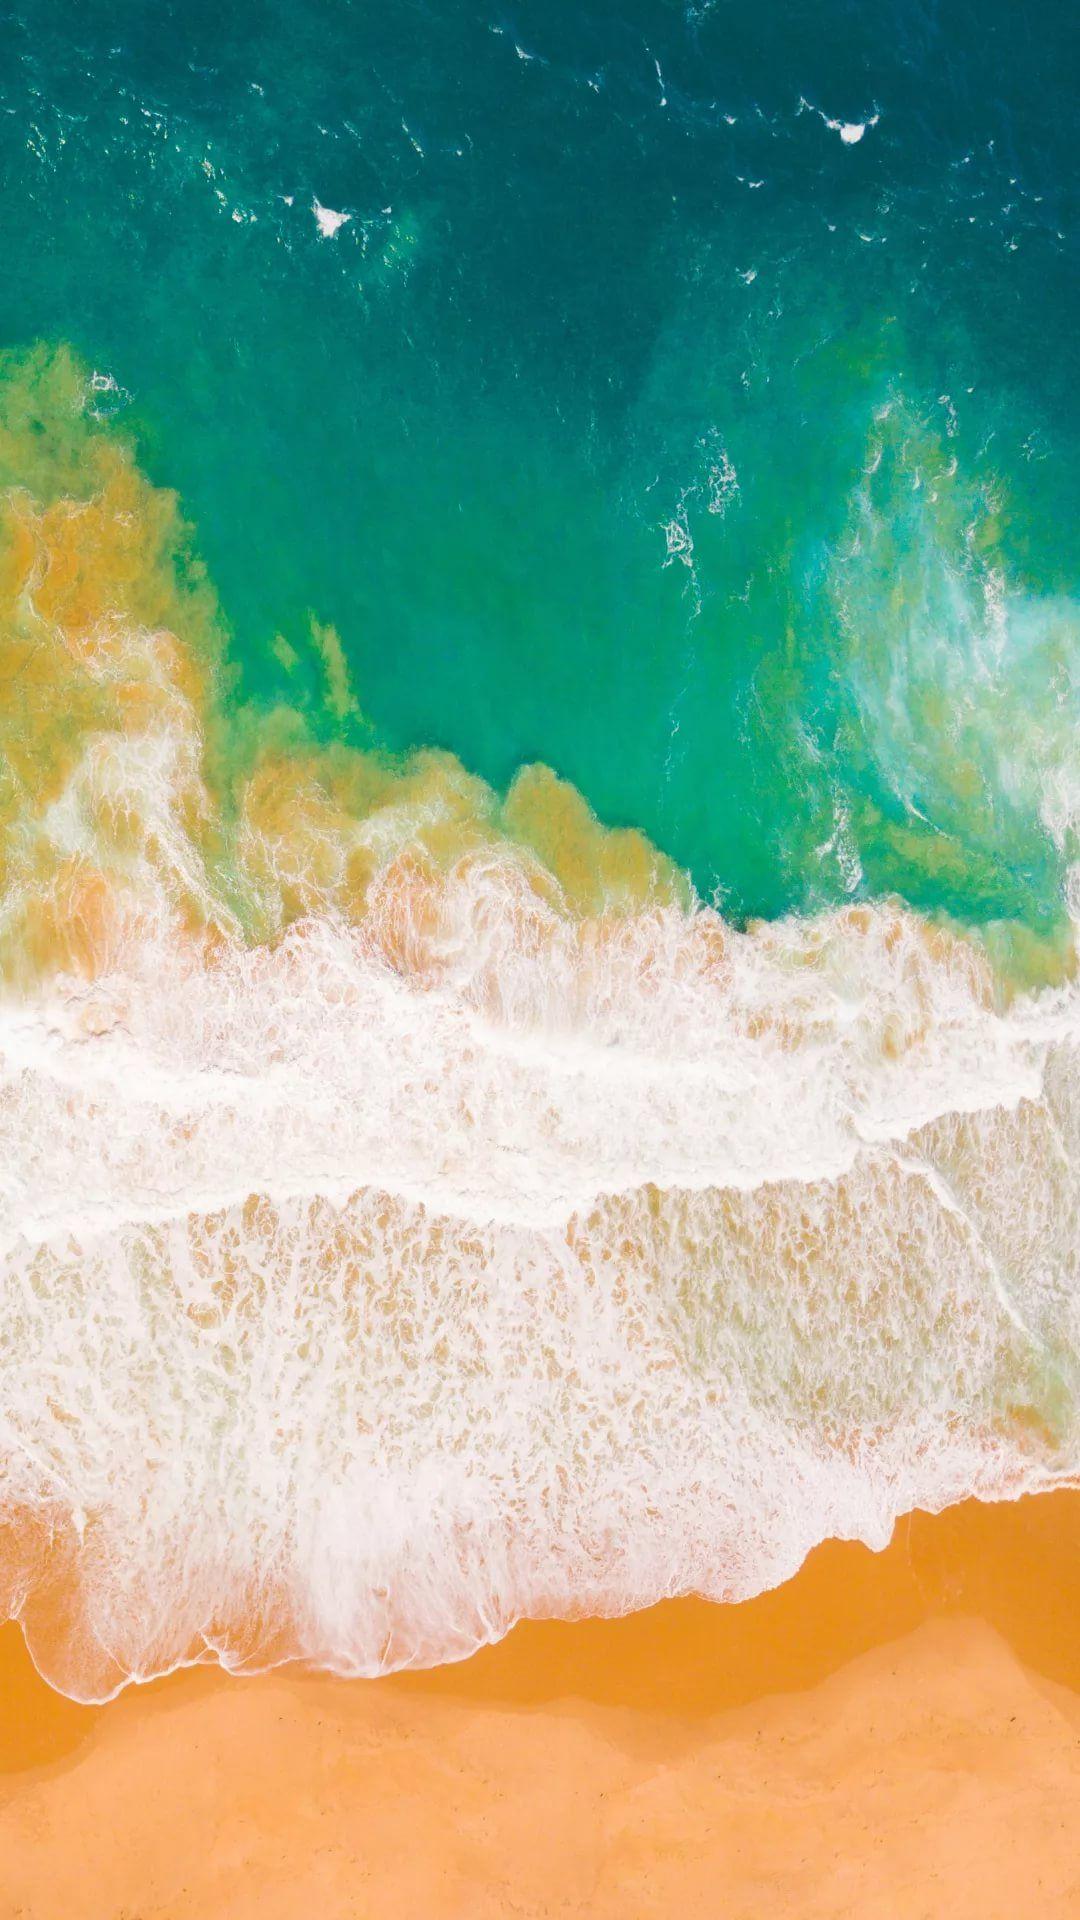 Beach Tumblr iPhone 7 wallpaper